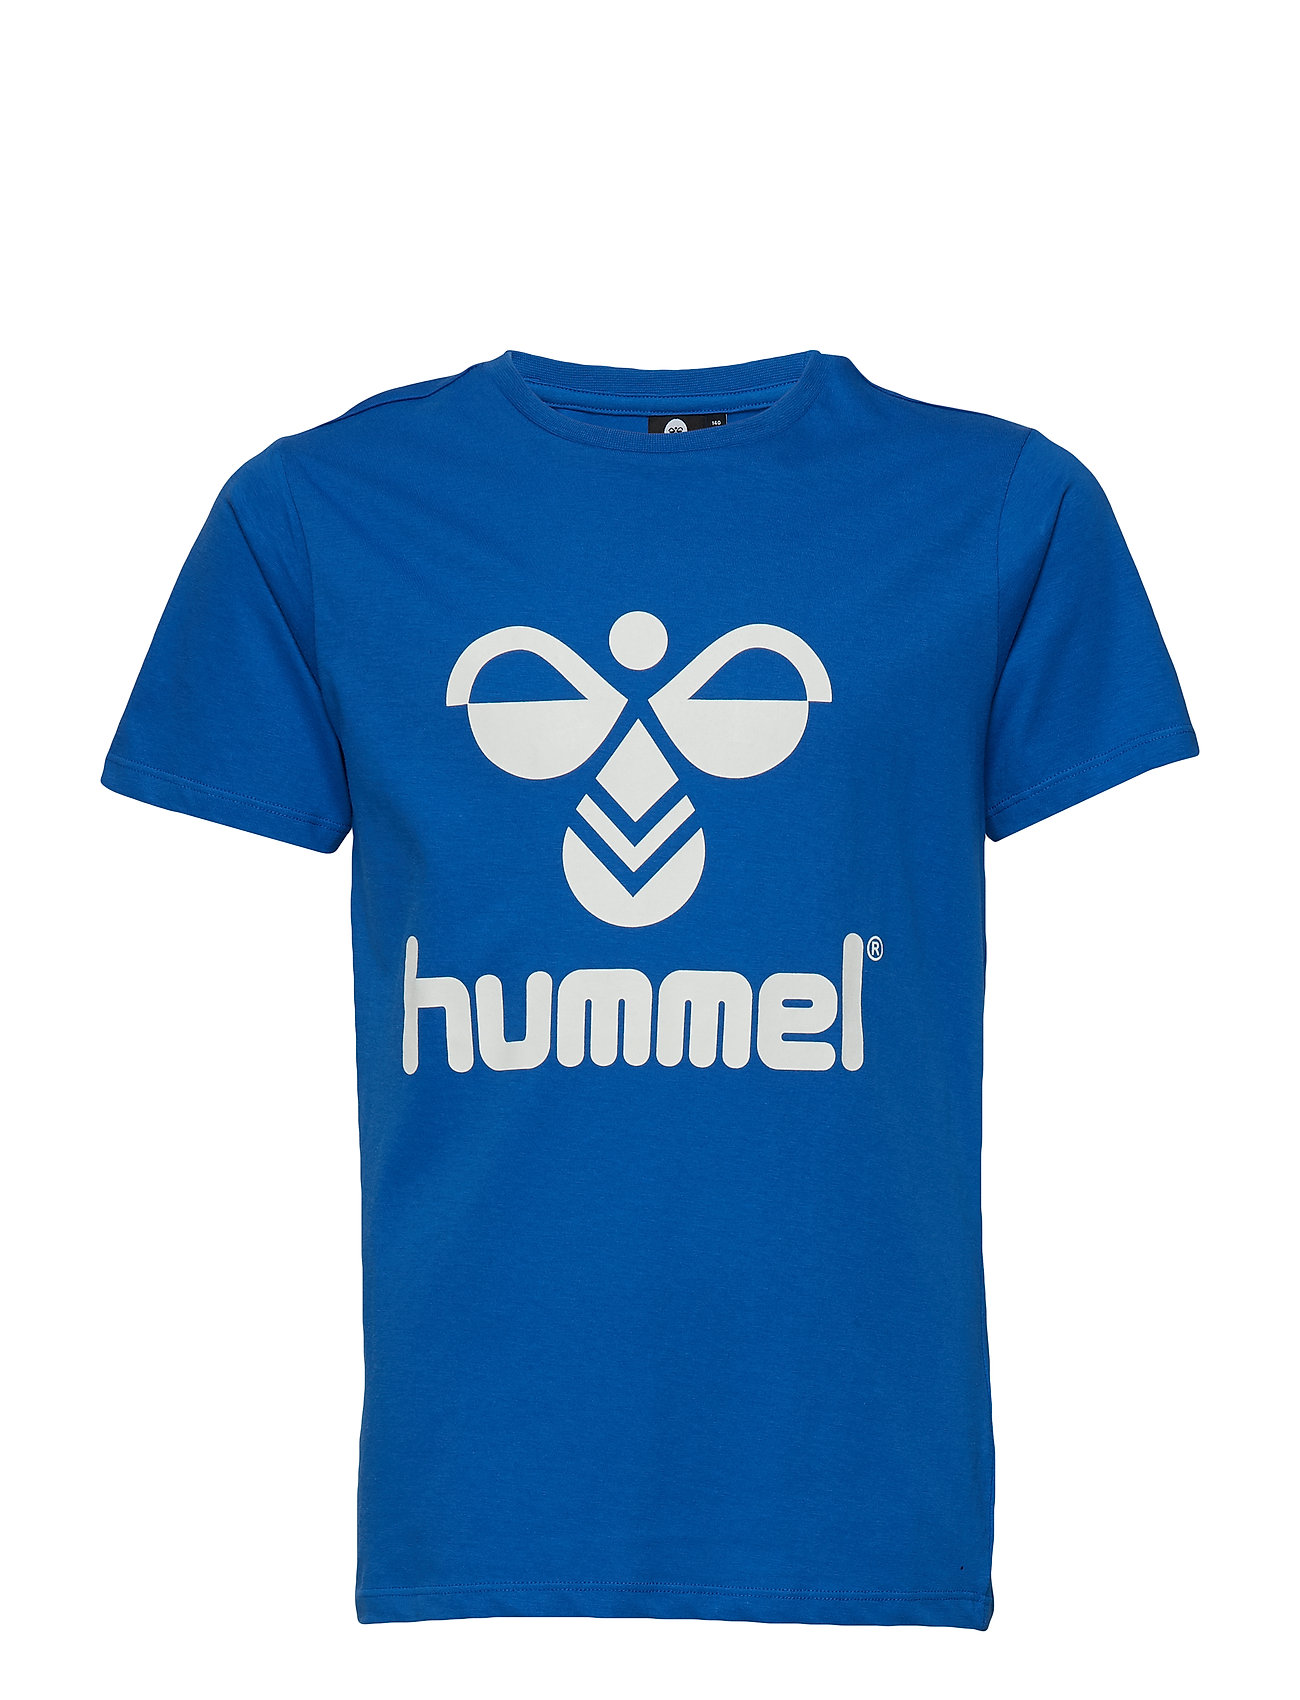 Hummel hmlTRES T-SHIRT S/S